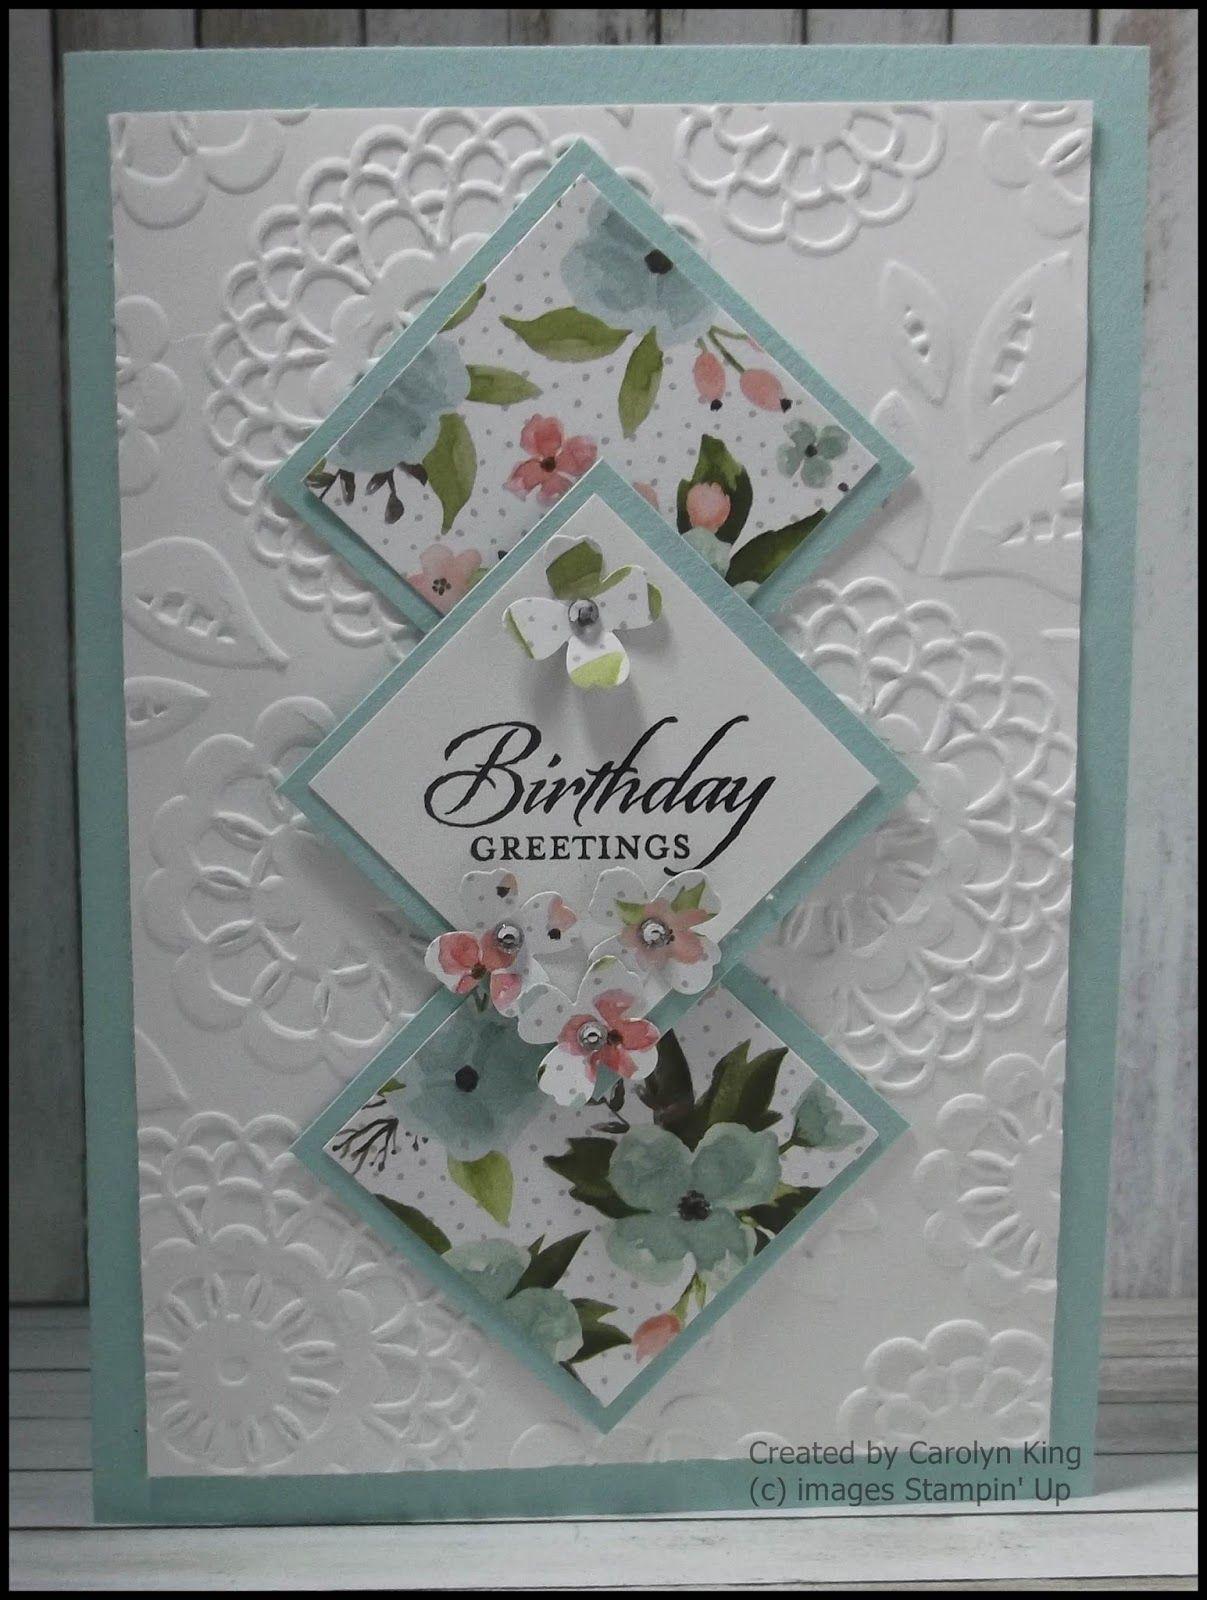 Carolyn King Card Craft Handmade Birthday Cards Embossed Cards